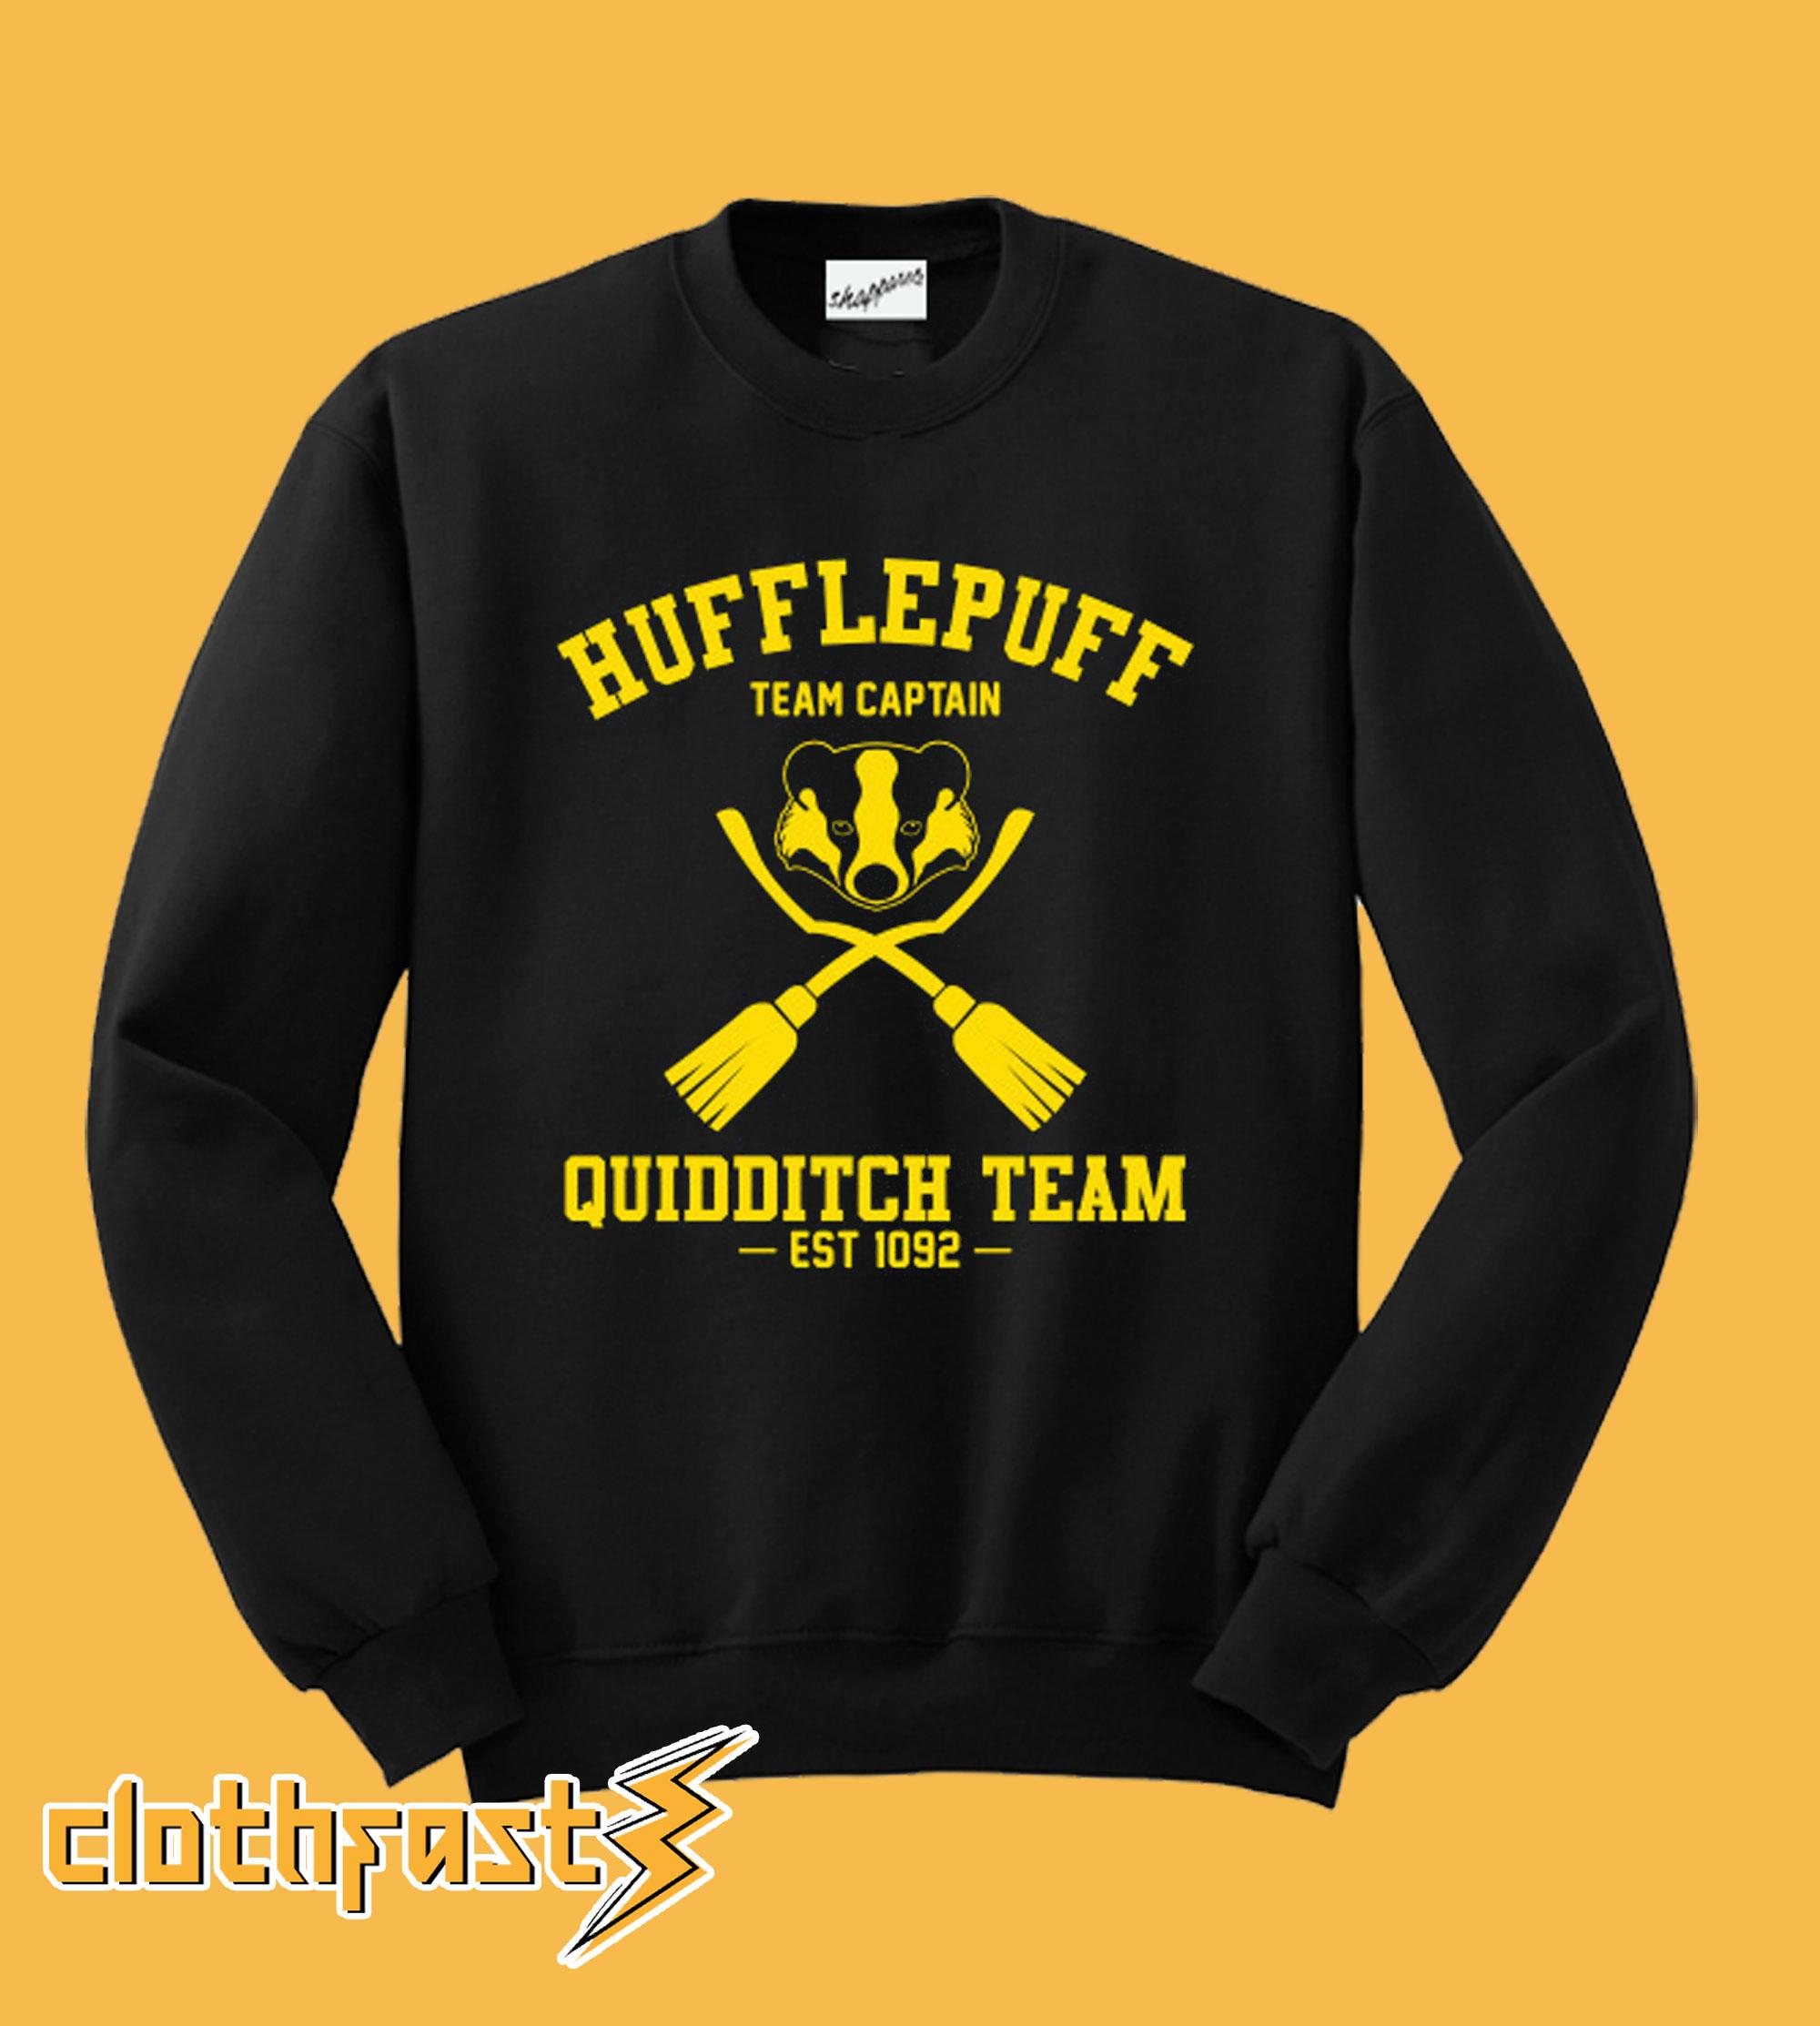 Hufflepuff Quidditch Sweatshirt